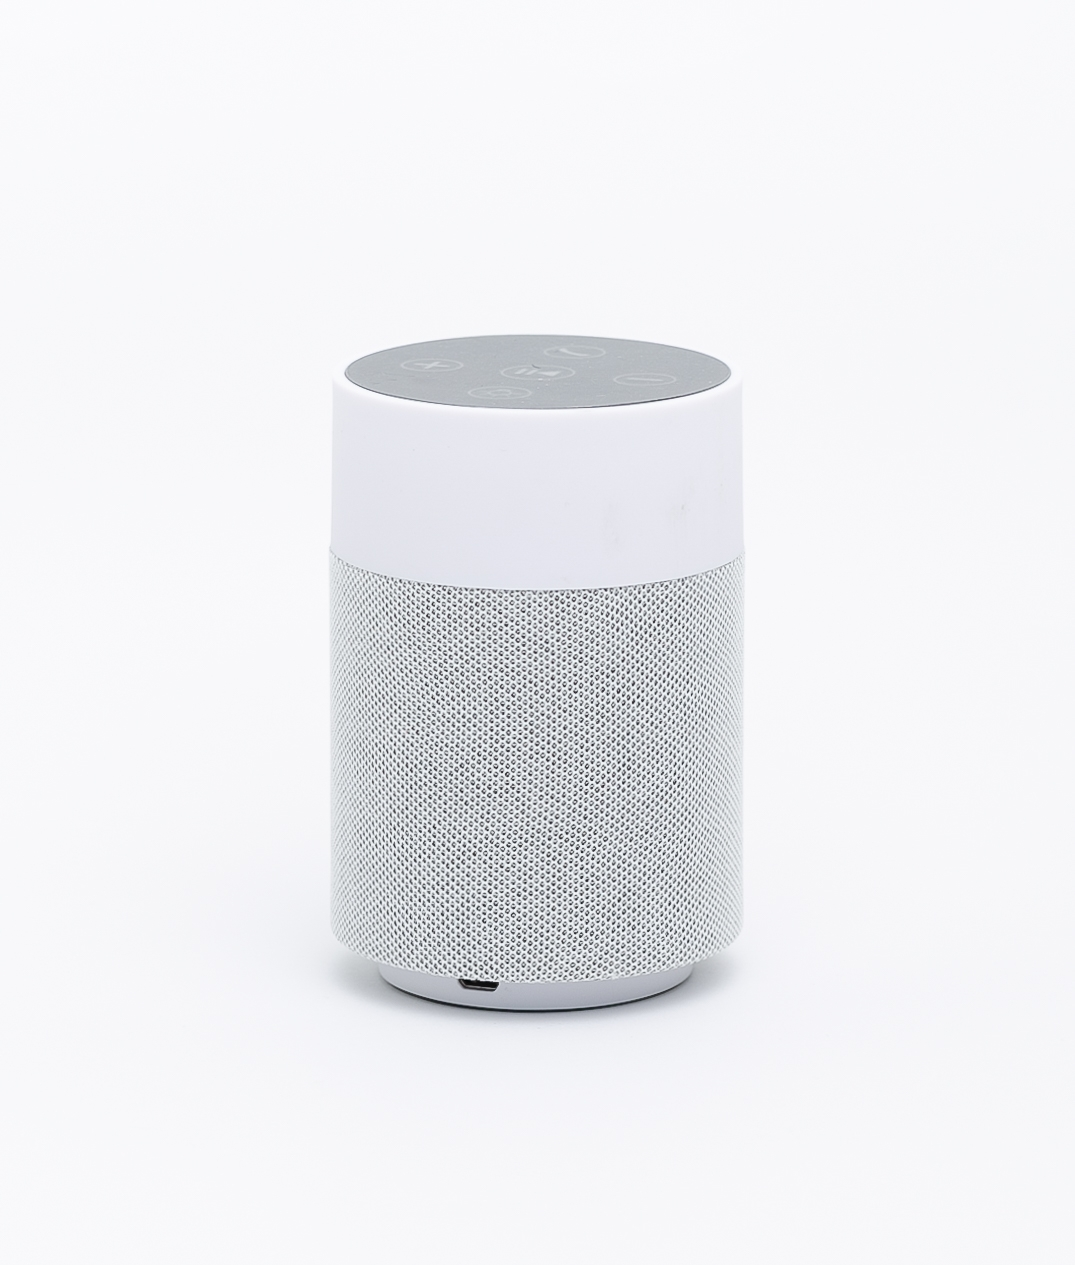 Altoparlante Bluetooth Abacus - Grigrio